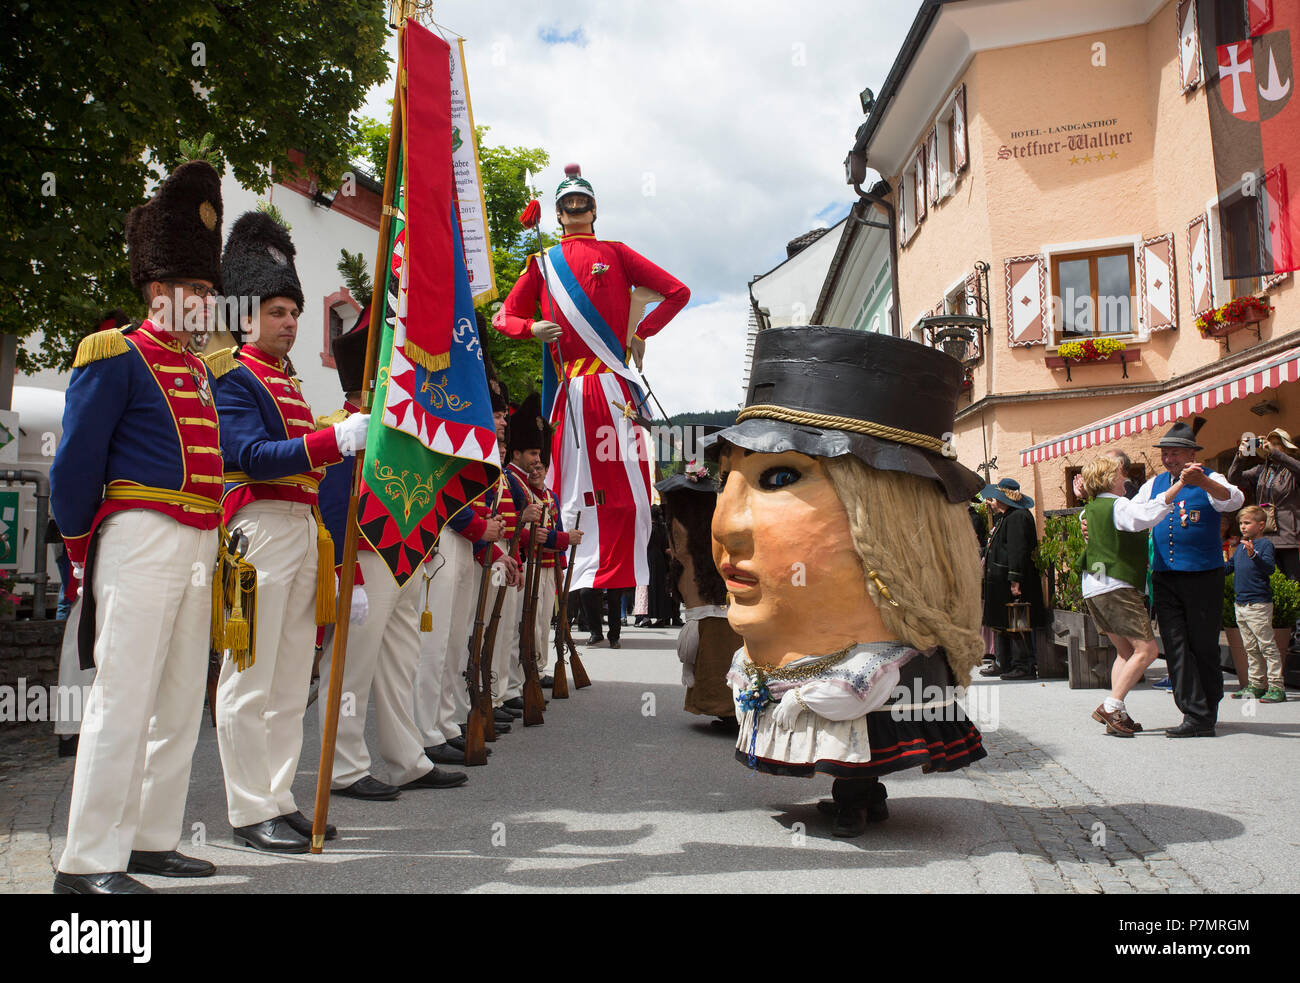 Austria, Salzburg State, Lungau region, Mauterndorf, Samson procession, Samson, giant figure, female dwarf, parade, Stock Photo